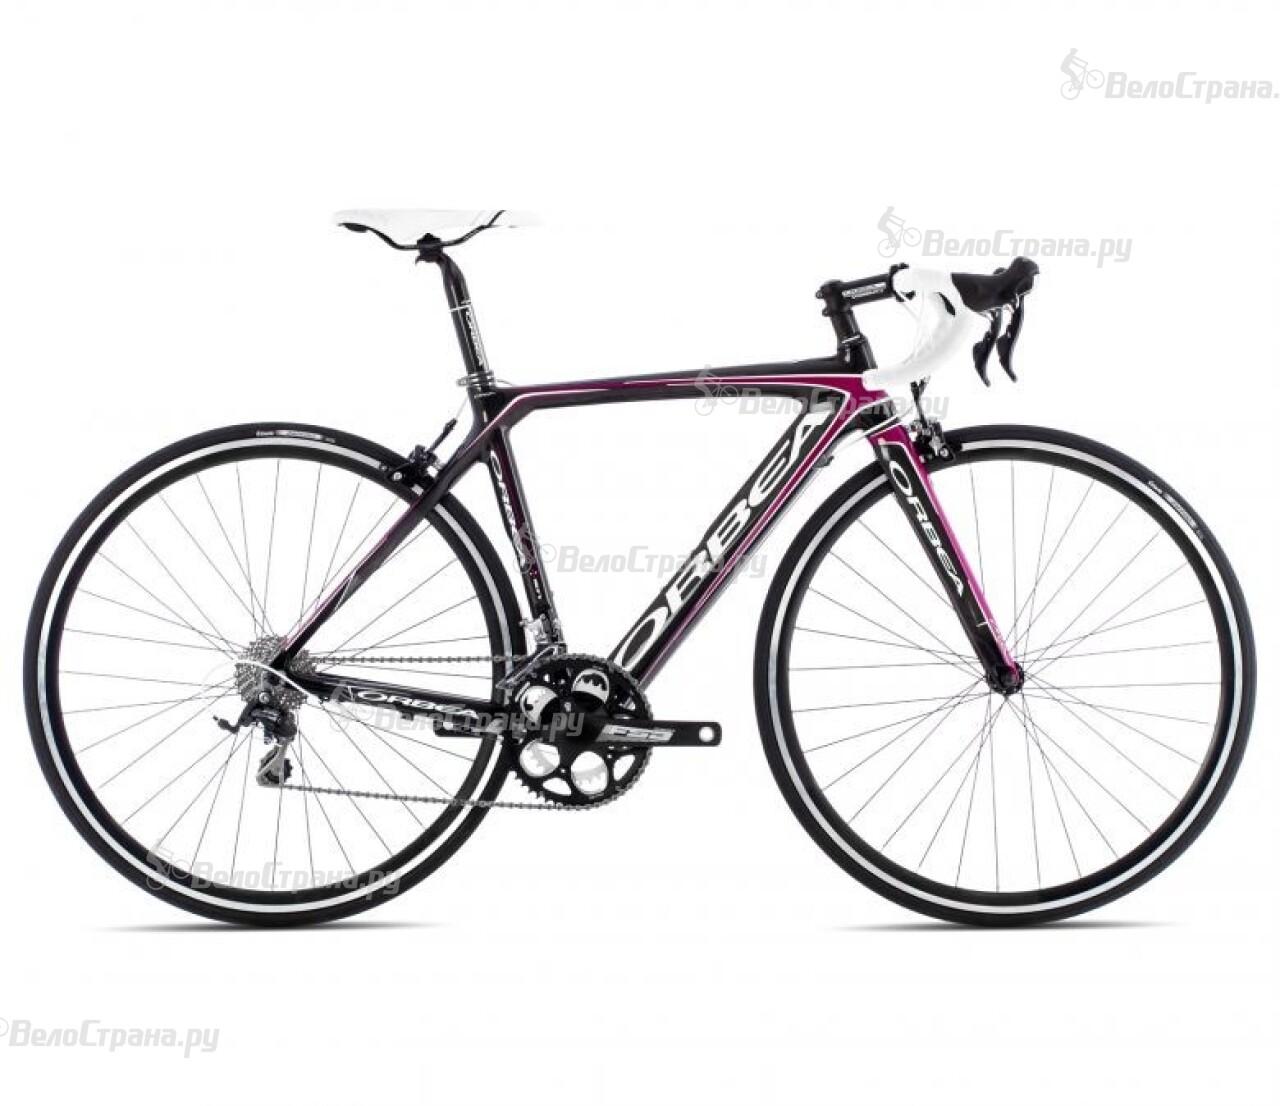 Велосипед Orbea Orca B Dama M50 (2014) аккумулятор для ноутбука oem 5200mah asus n61 n61j n61d n61v n61vg n61ja n61jv n53 a32 m50 m50s n53s n53sv a32 m50 a32 n61 a32 x 64 33 m50 n53s n53 a32 m50 m50s n53s n53sv a32 m50